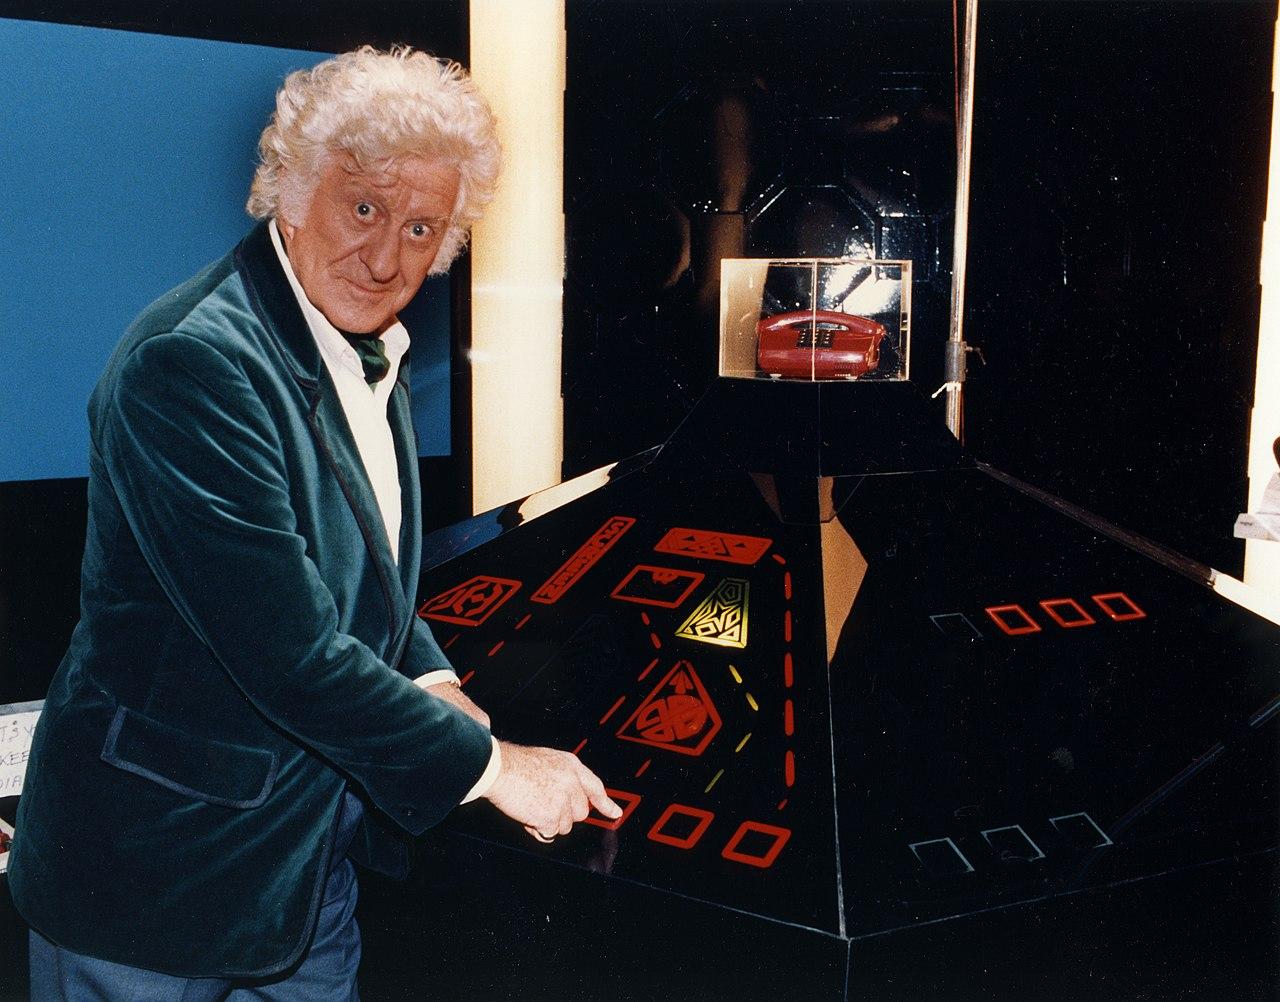 File:Dr Who, John Pertwee (10842597324).jpg - Wikimedia ...  File:Dr Who, Jo...